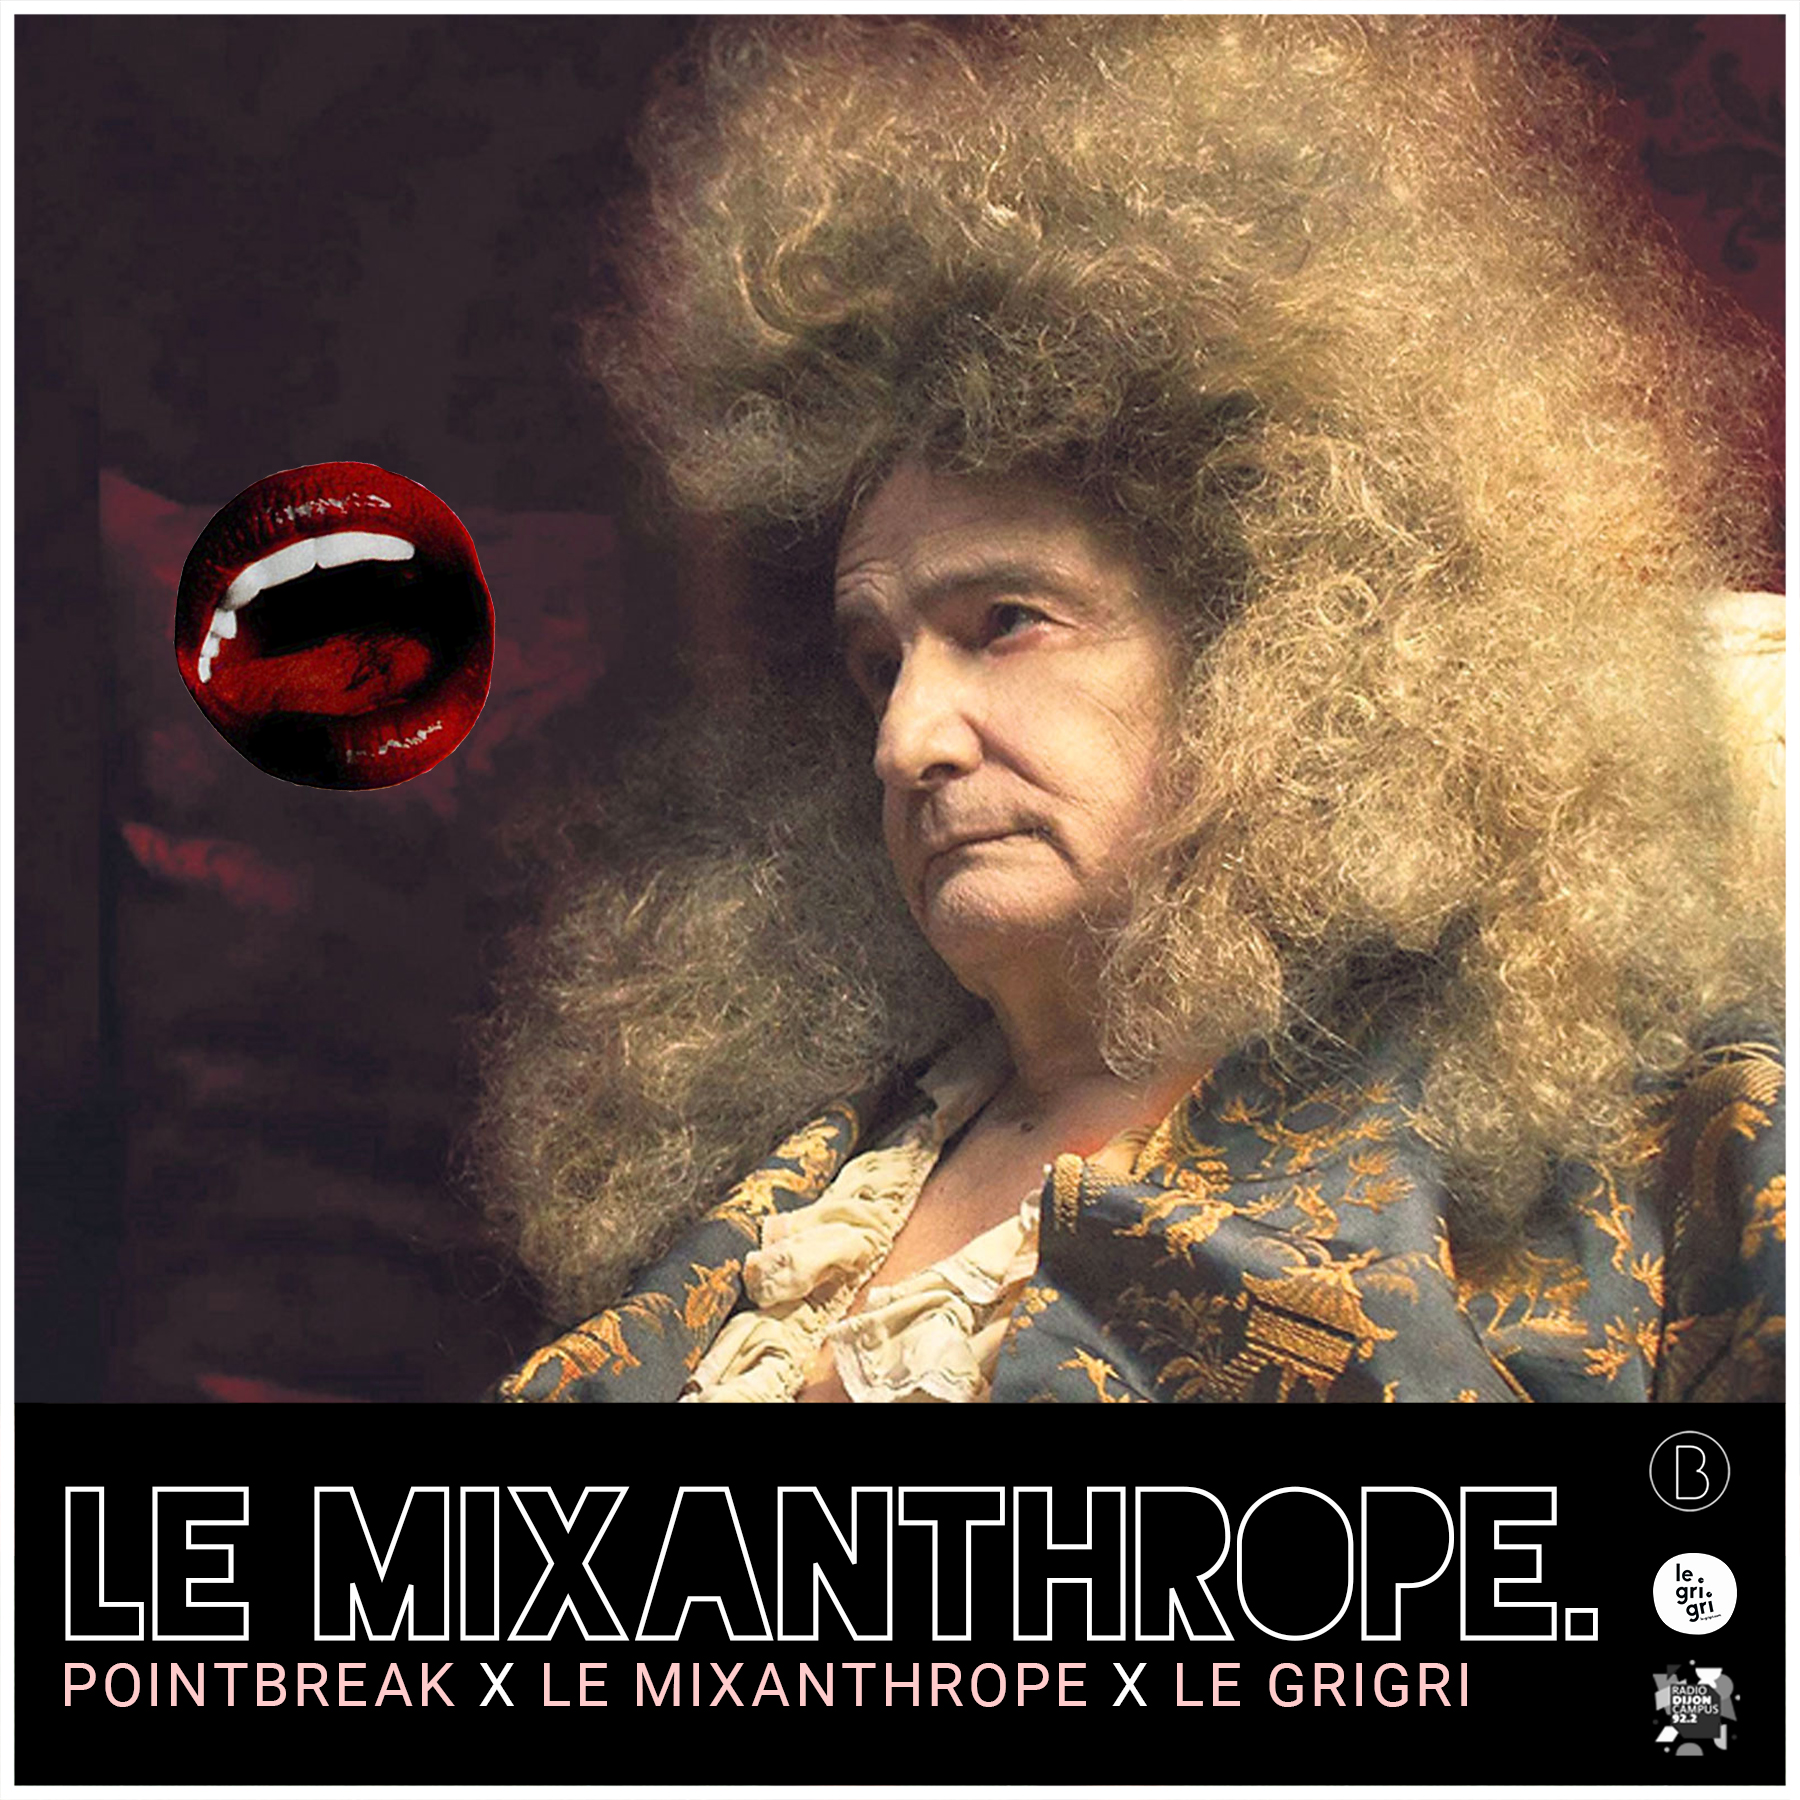 PointBreak Le Mixanthrope 1